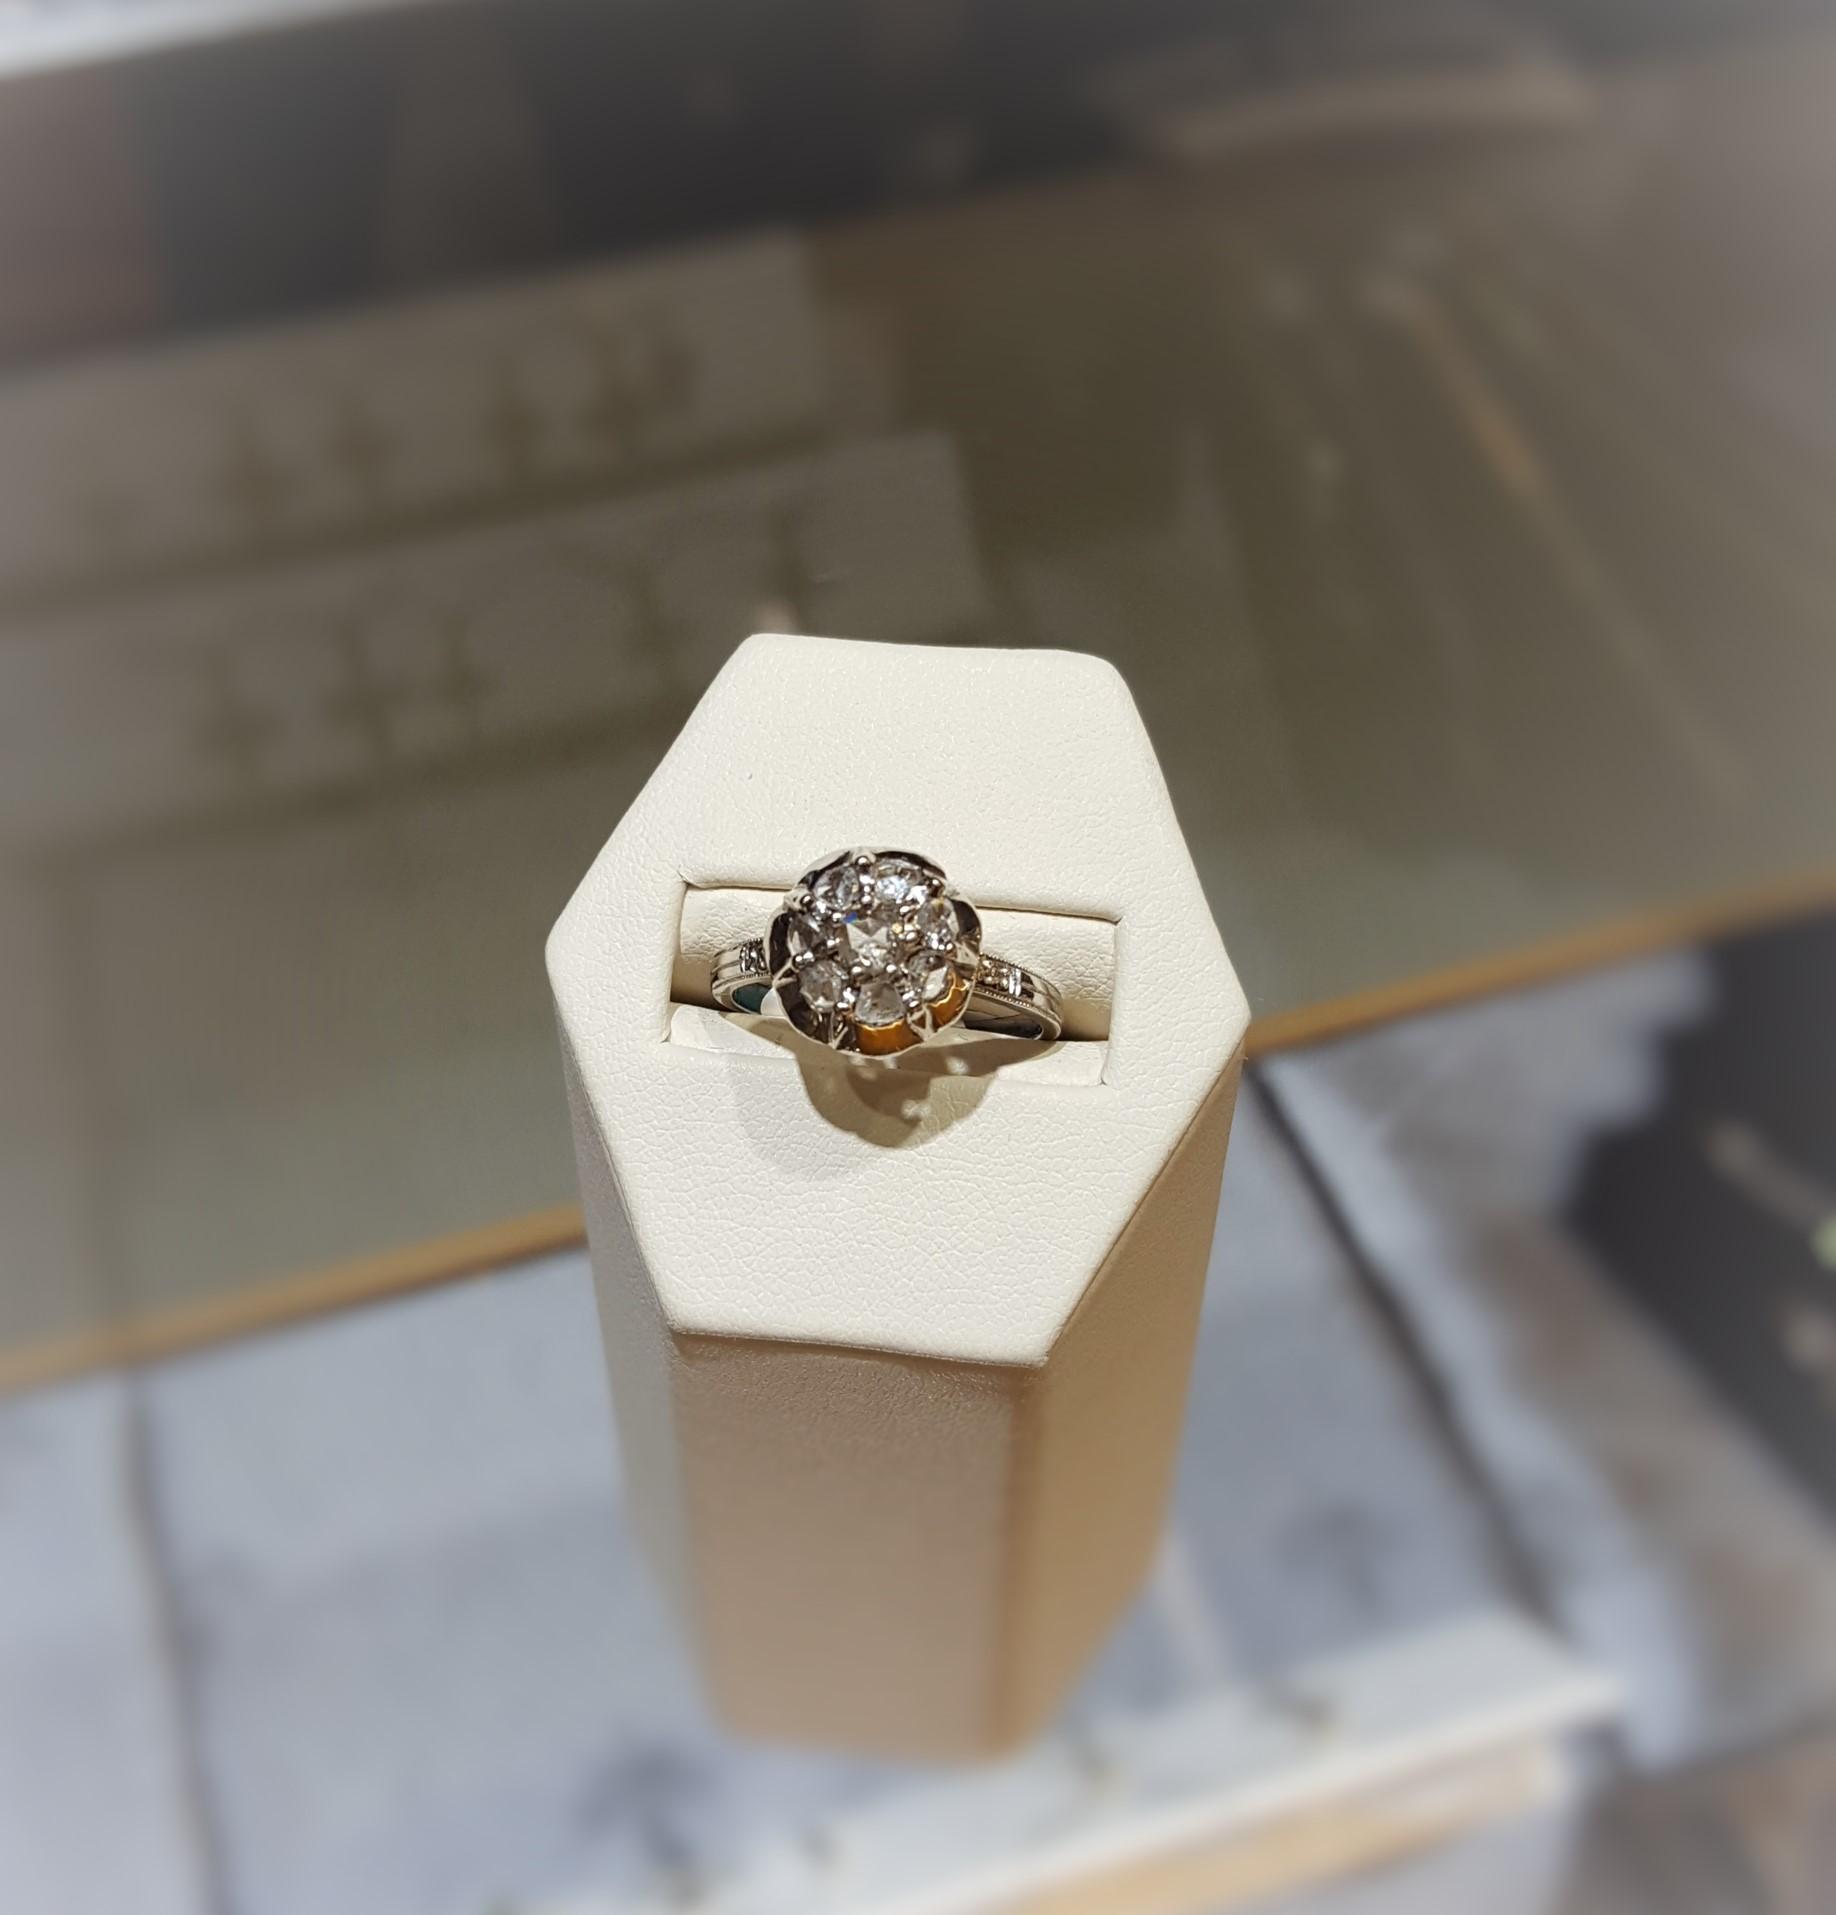 Antique 1890's Diamond Engagement